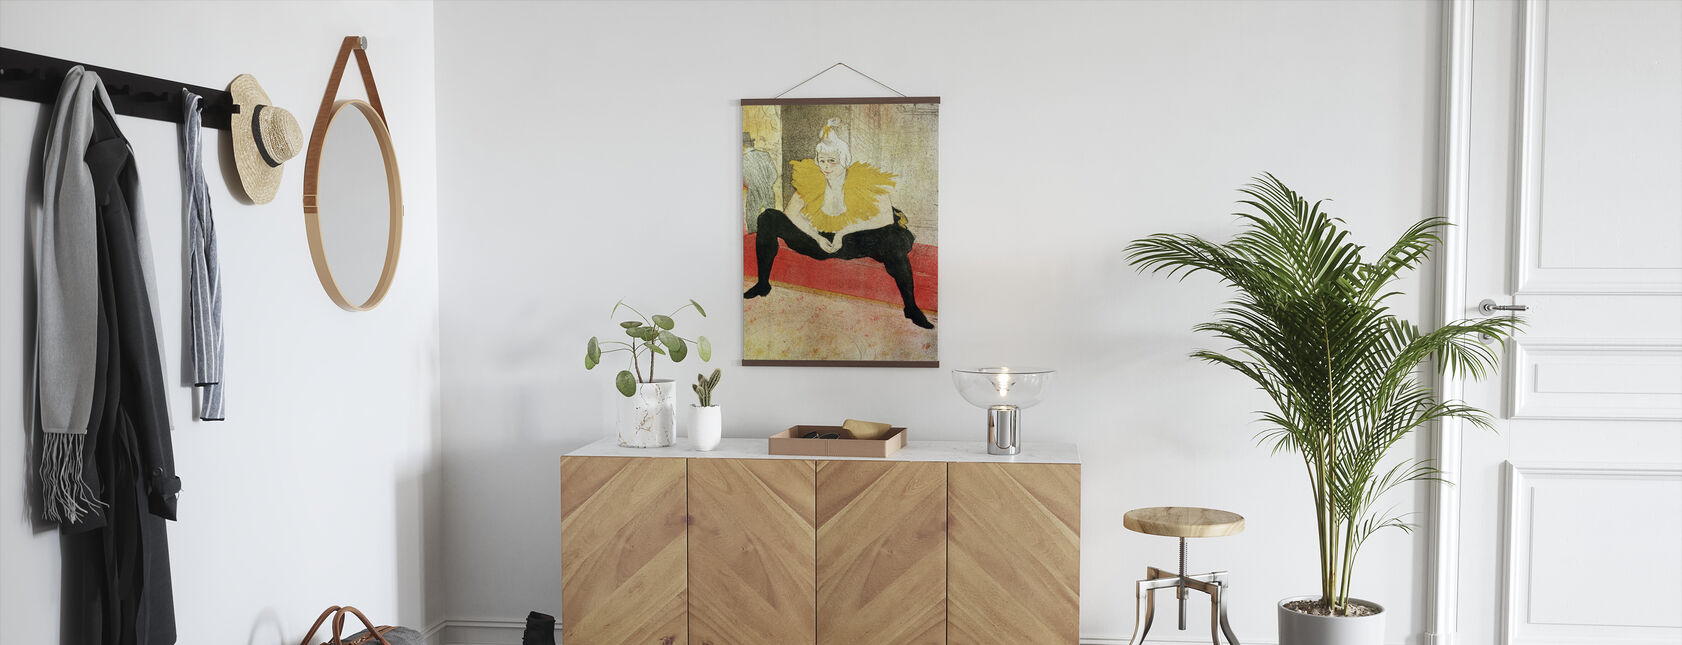 Clowness Looks Around, Henri Toulouse Lautrec - Poster - Hallway